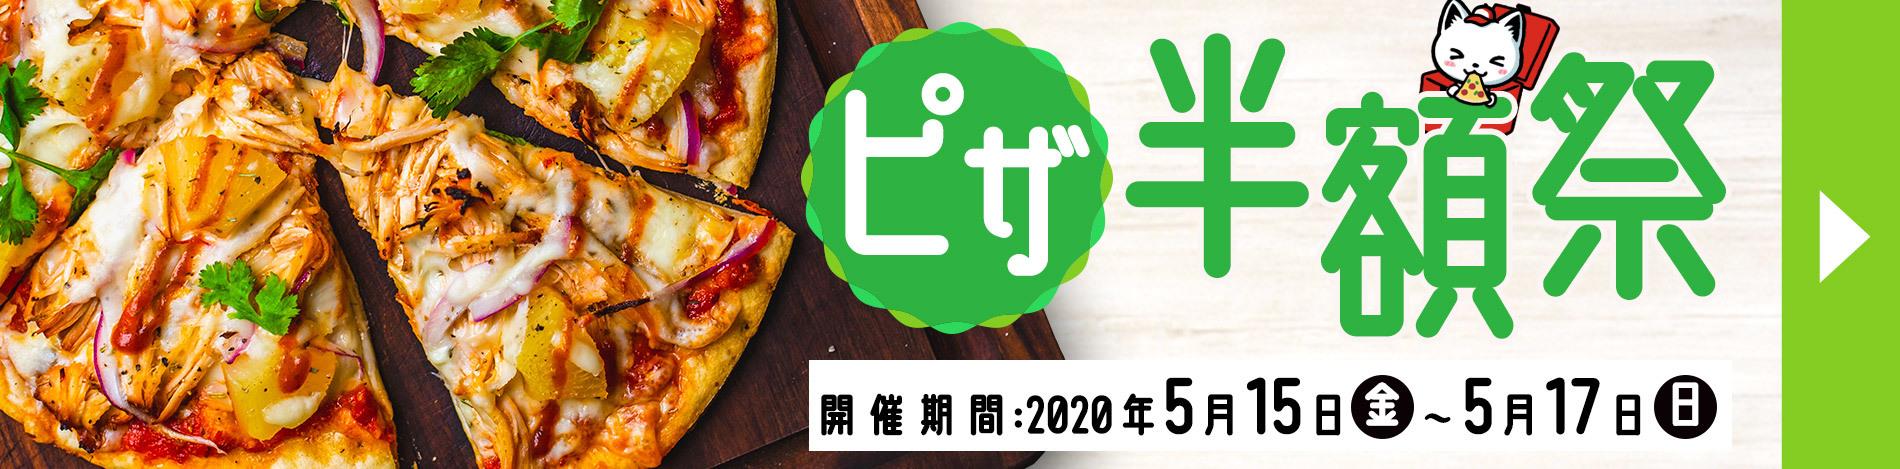 pizzafes2005_banner_l.jpg